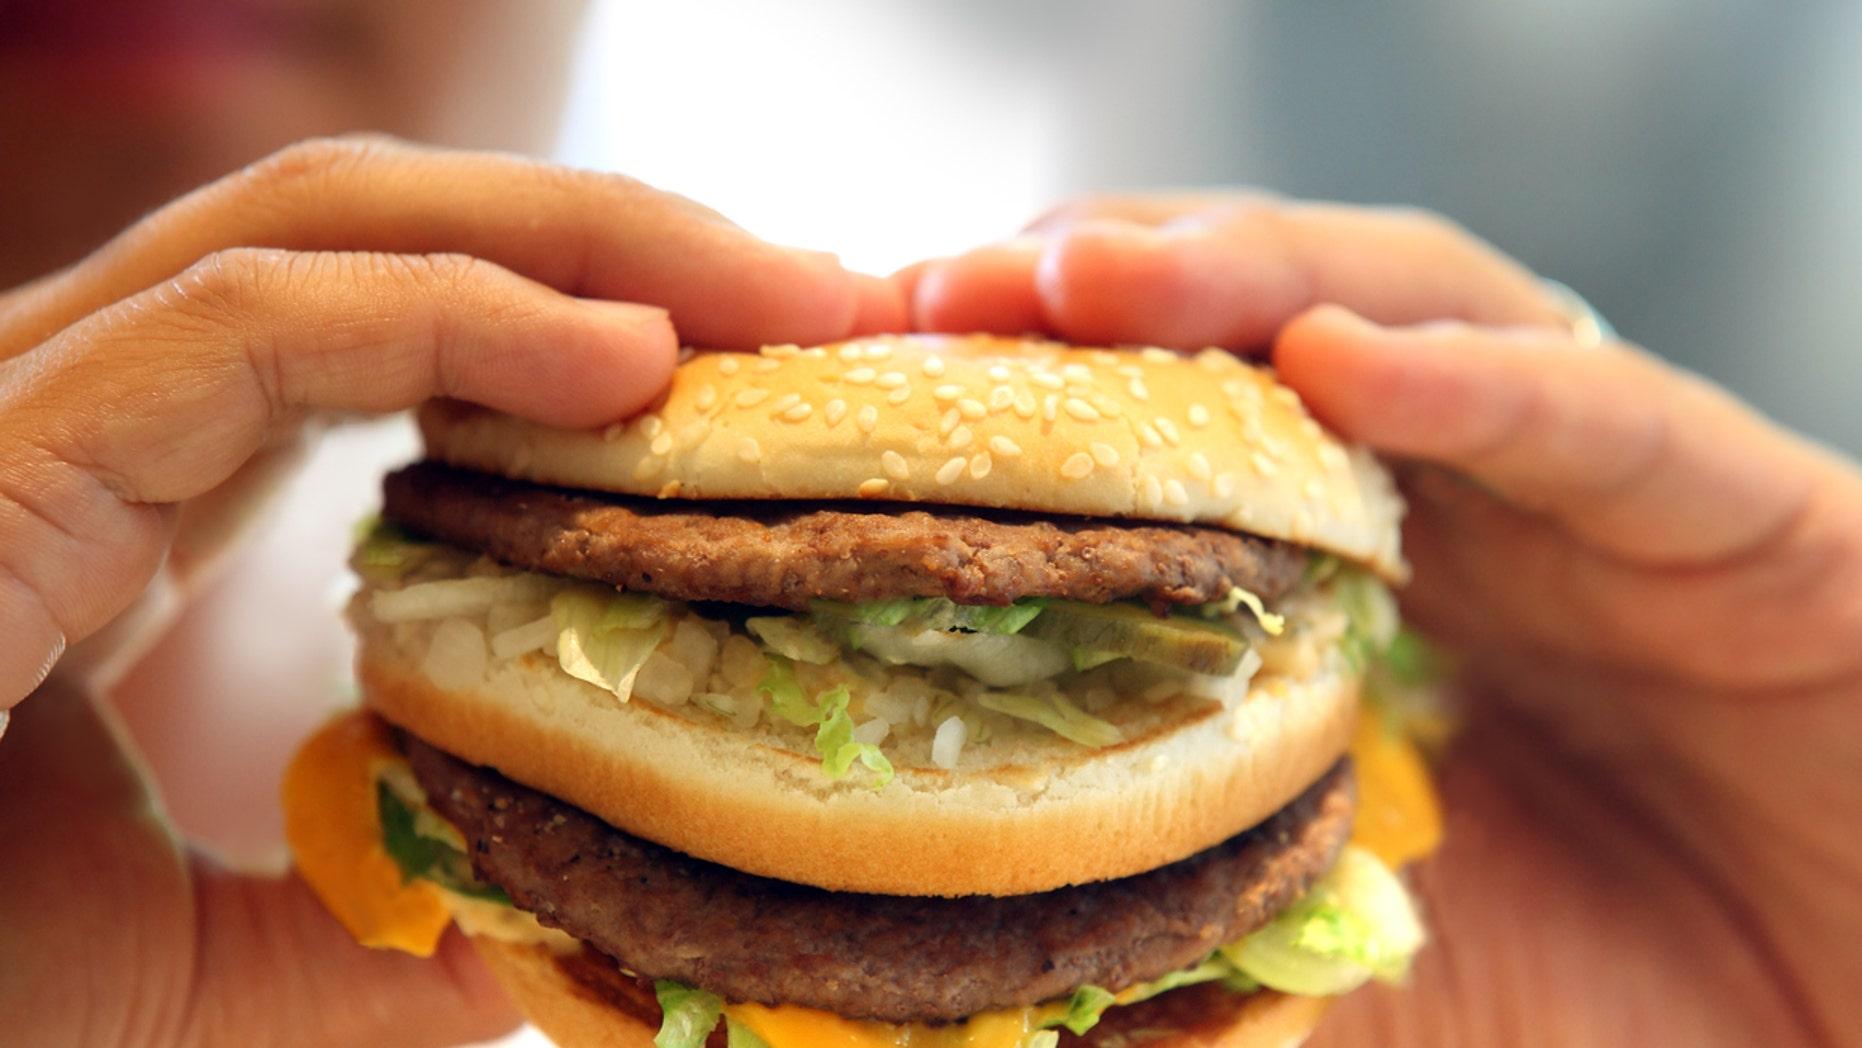 man's hands, holding onto a burger